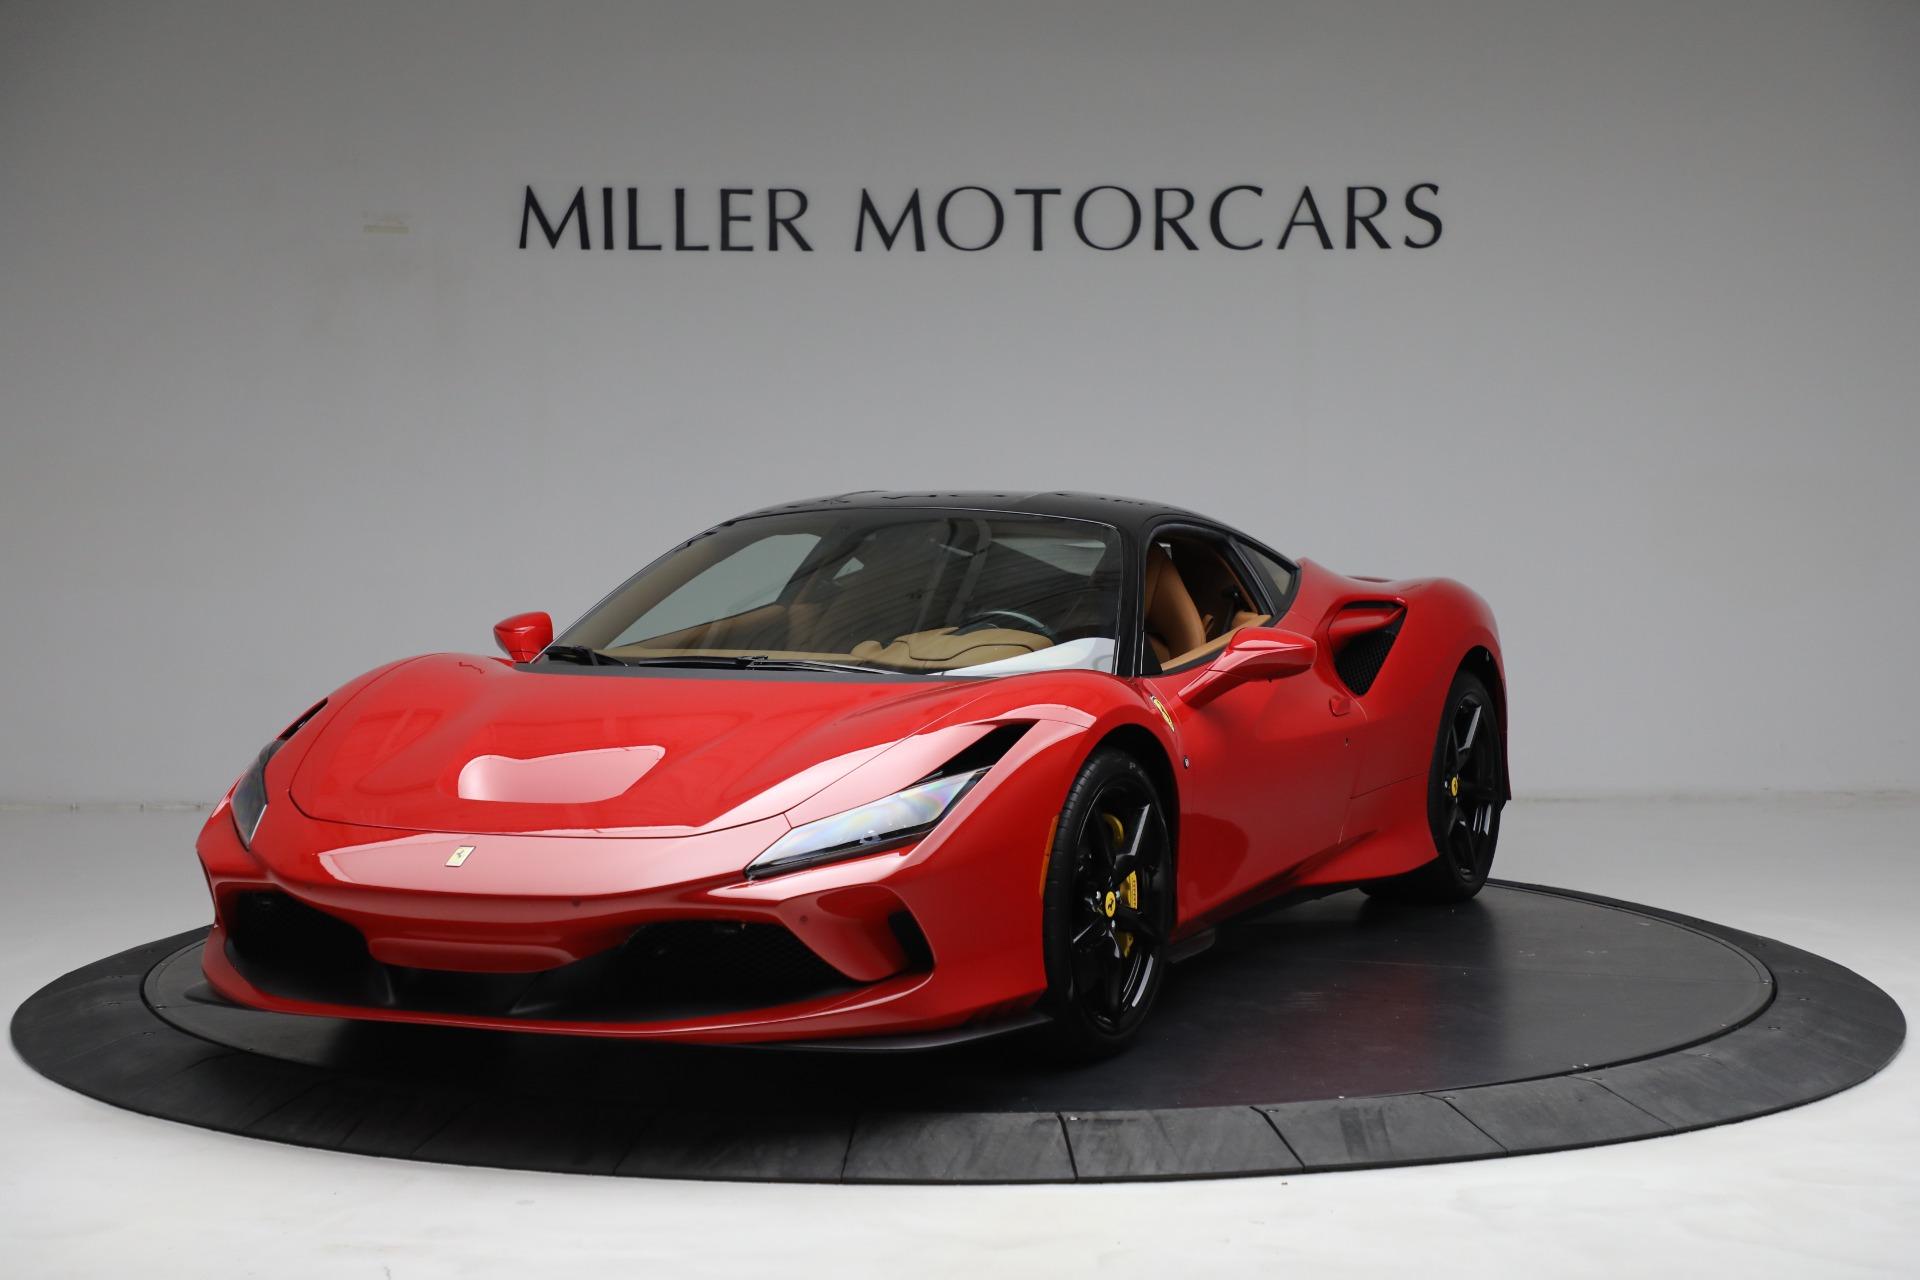 Used 2021 Ferrari F8 Tributo for sale Call for price at Aston Martin of Greenwich in Greenwich CT 06830 1